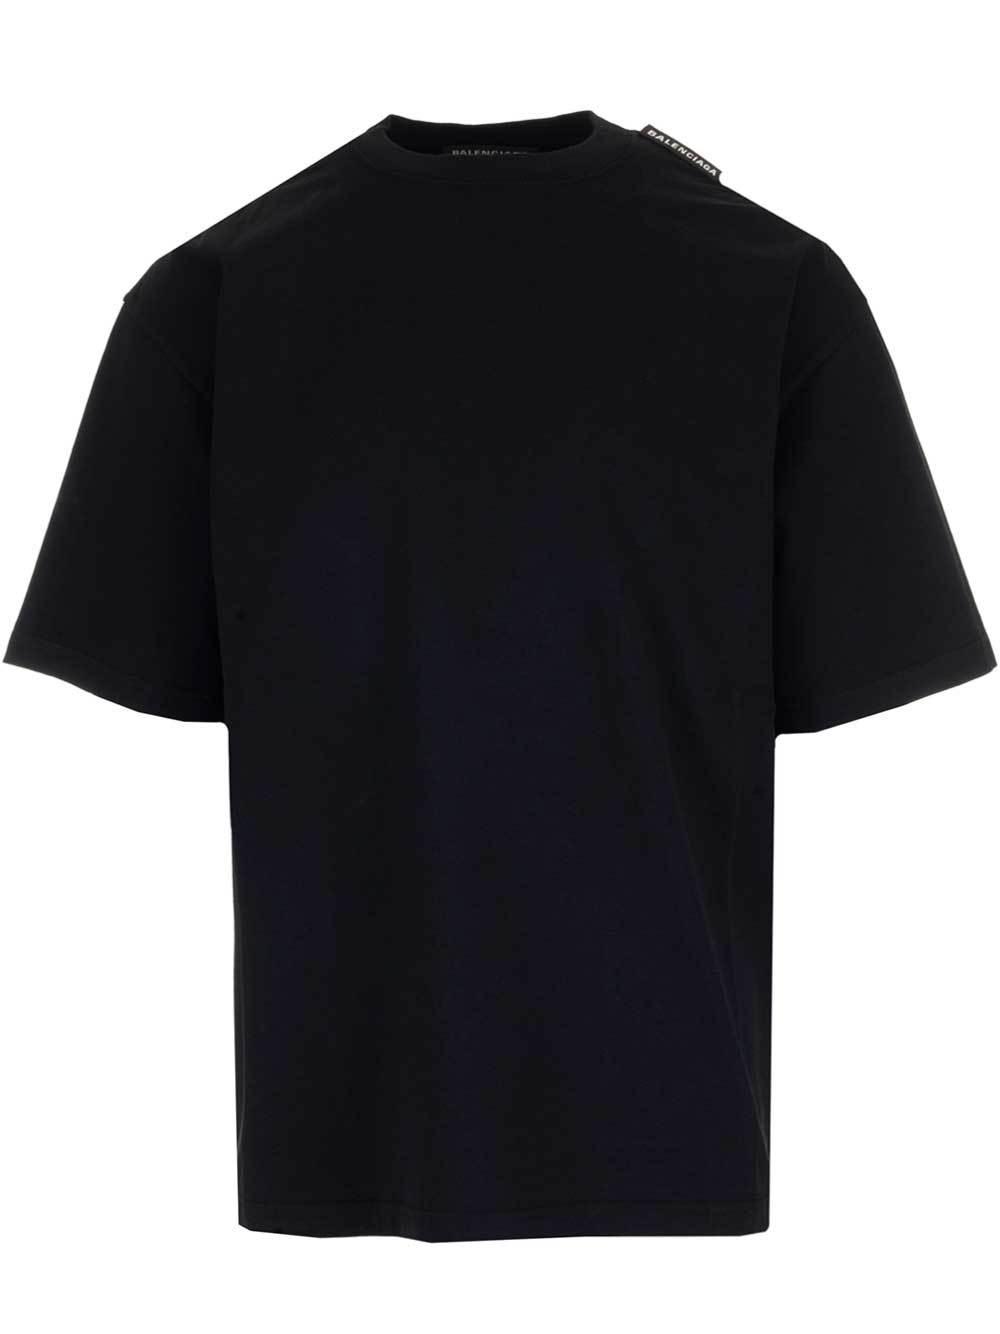 20250808c Lyst - Balenciaga Logo Tag T-shirt in Black for Men